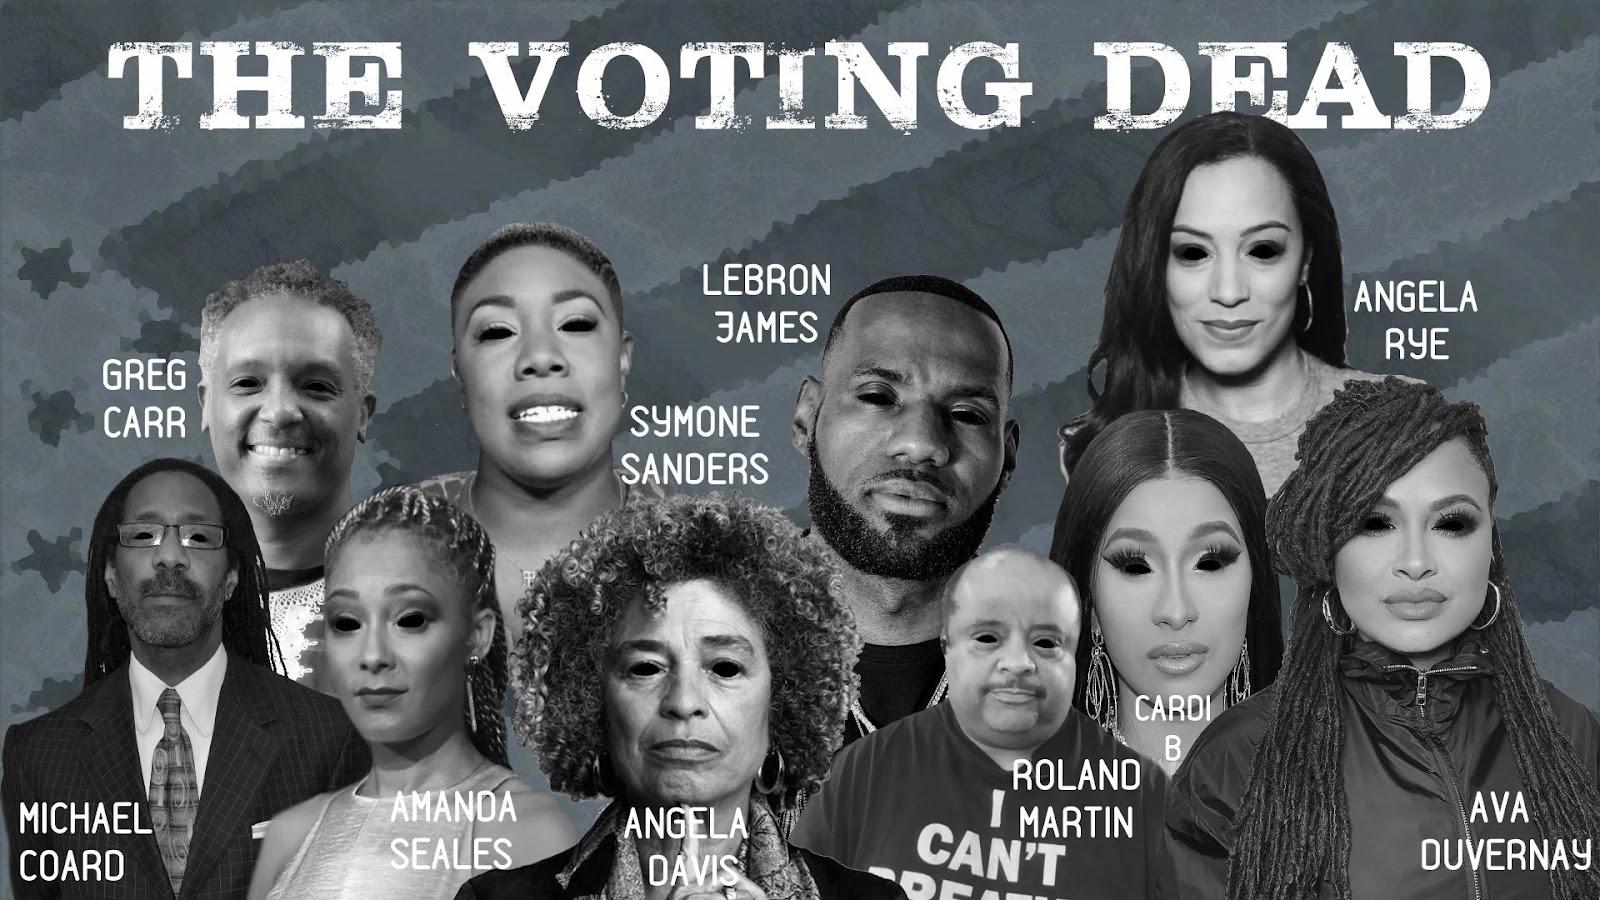 The voting dead - Negro Reformists